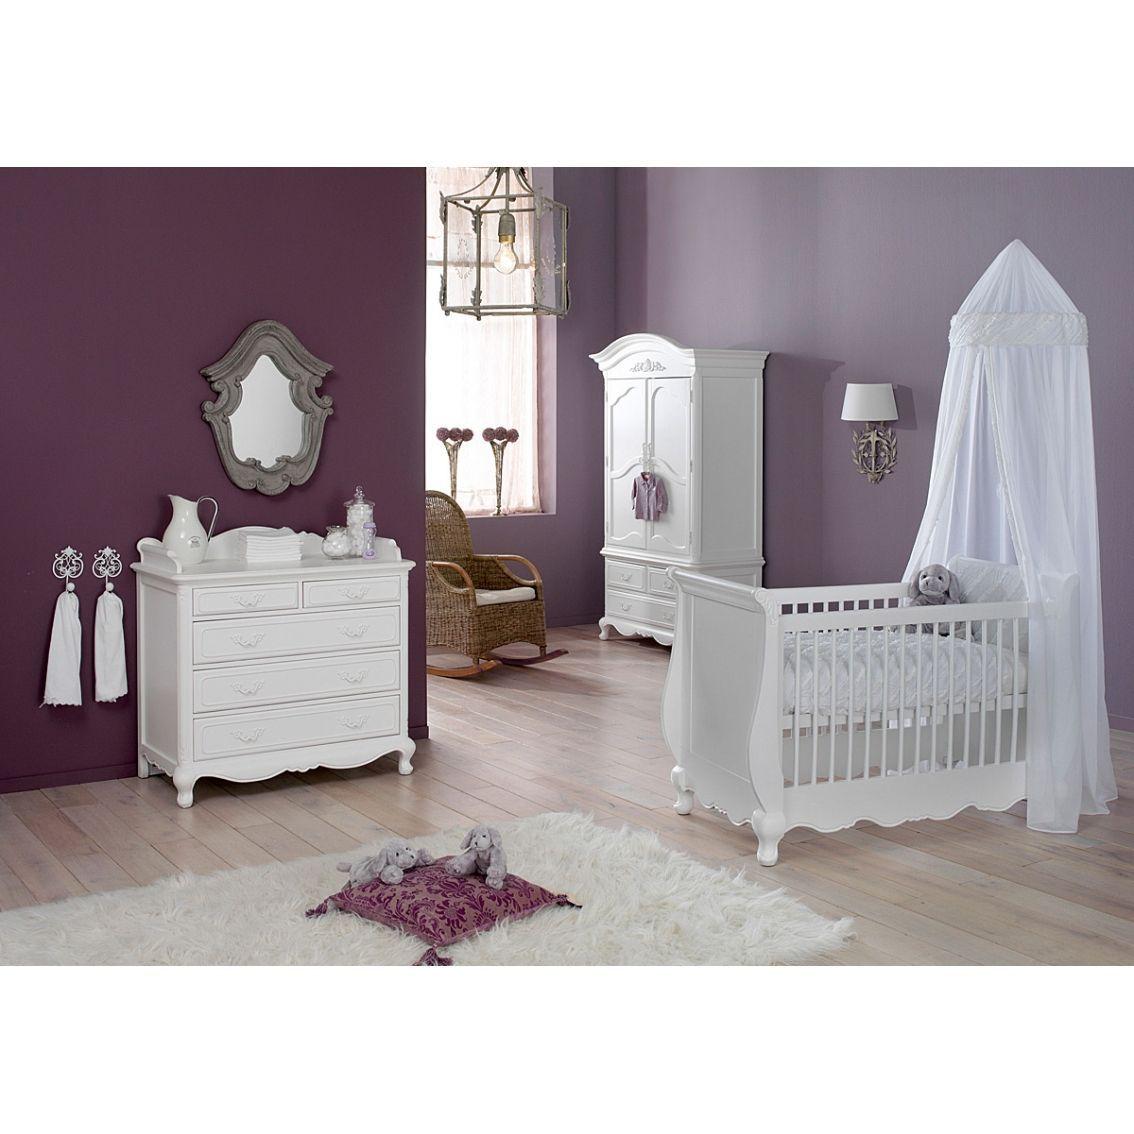 Amazing Kidsmill Claudia Nursery Furniture Set 7793 2187 Zoom Jpg 1 134